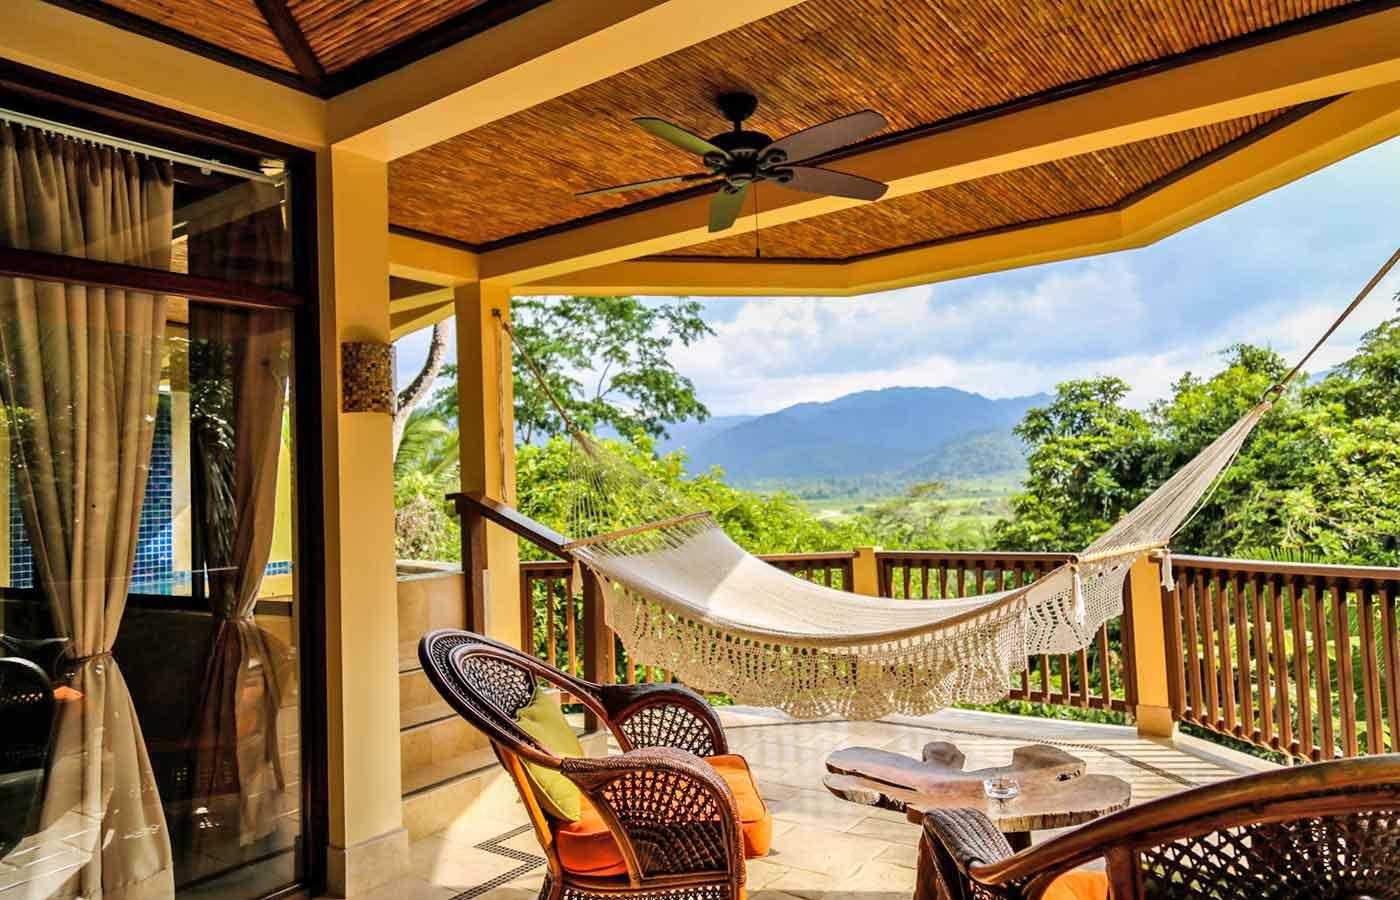 Sleeping Giant Rainforest Lodge, Belize